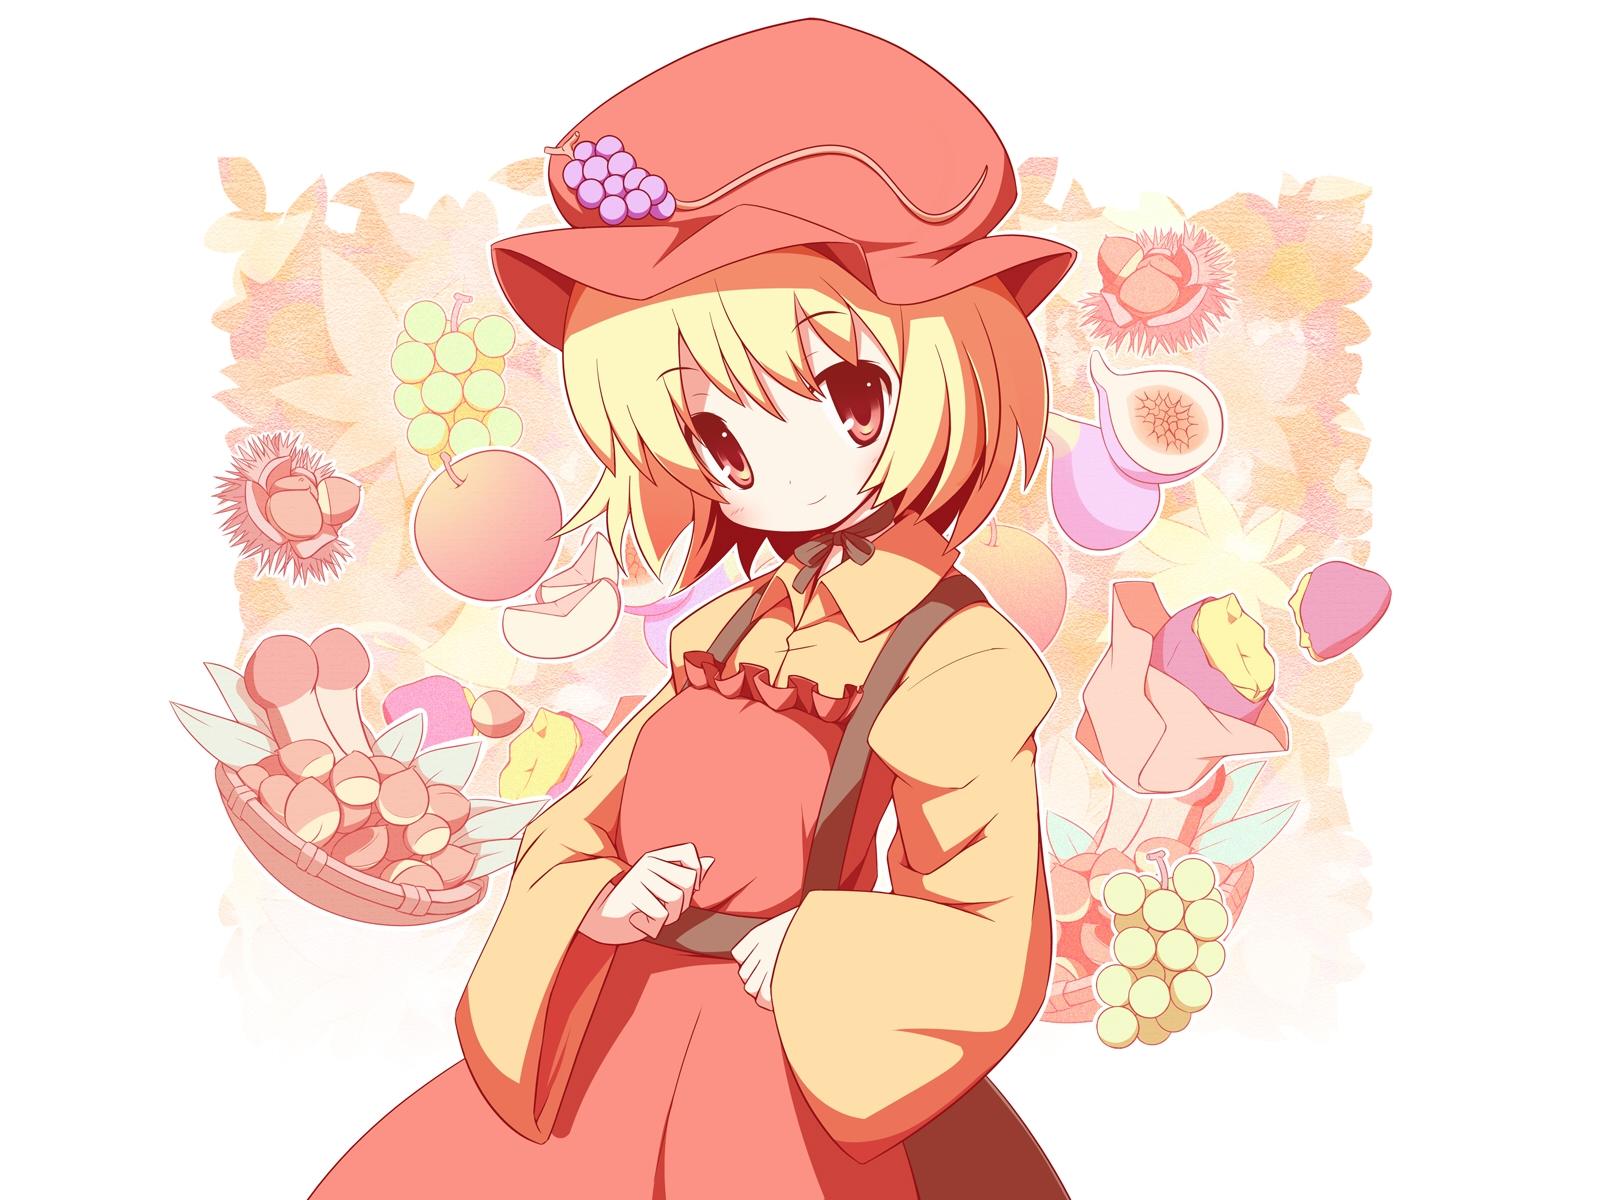 Unduh 660 Koleksi Wallpaper Anime Imut Hd HD Gratid